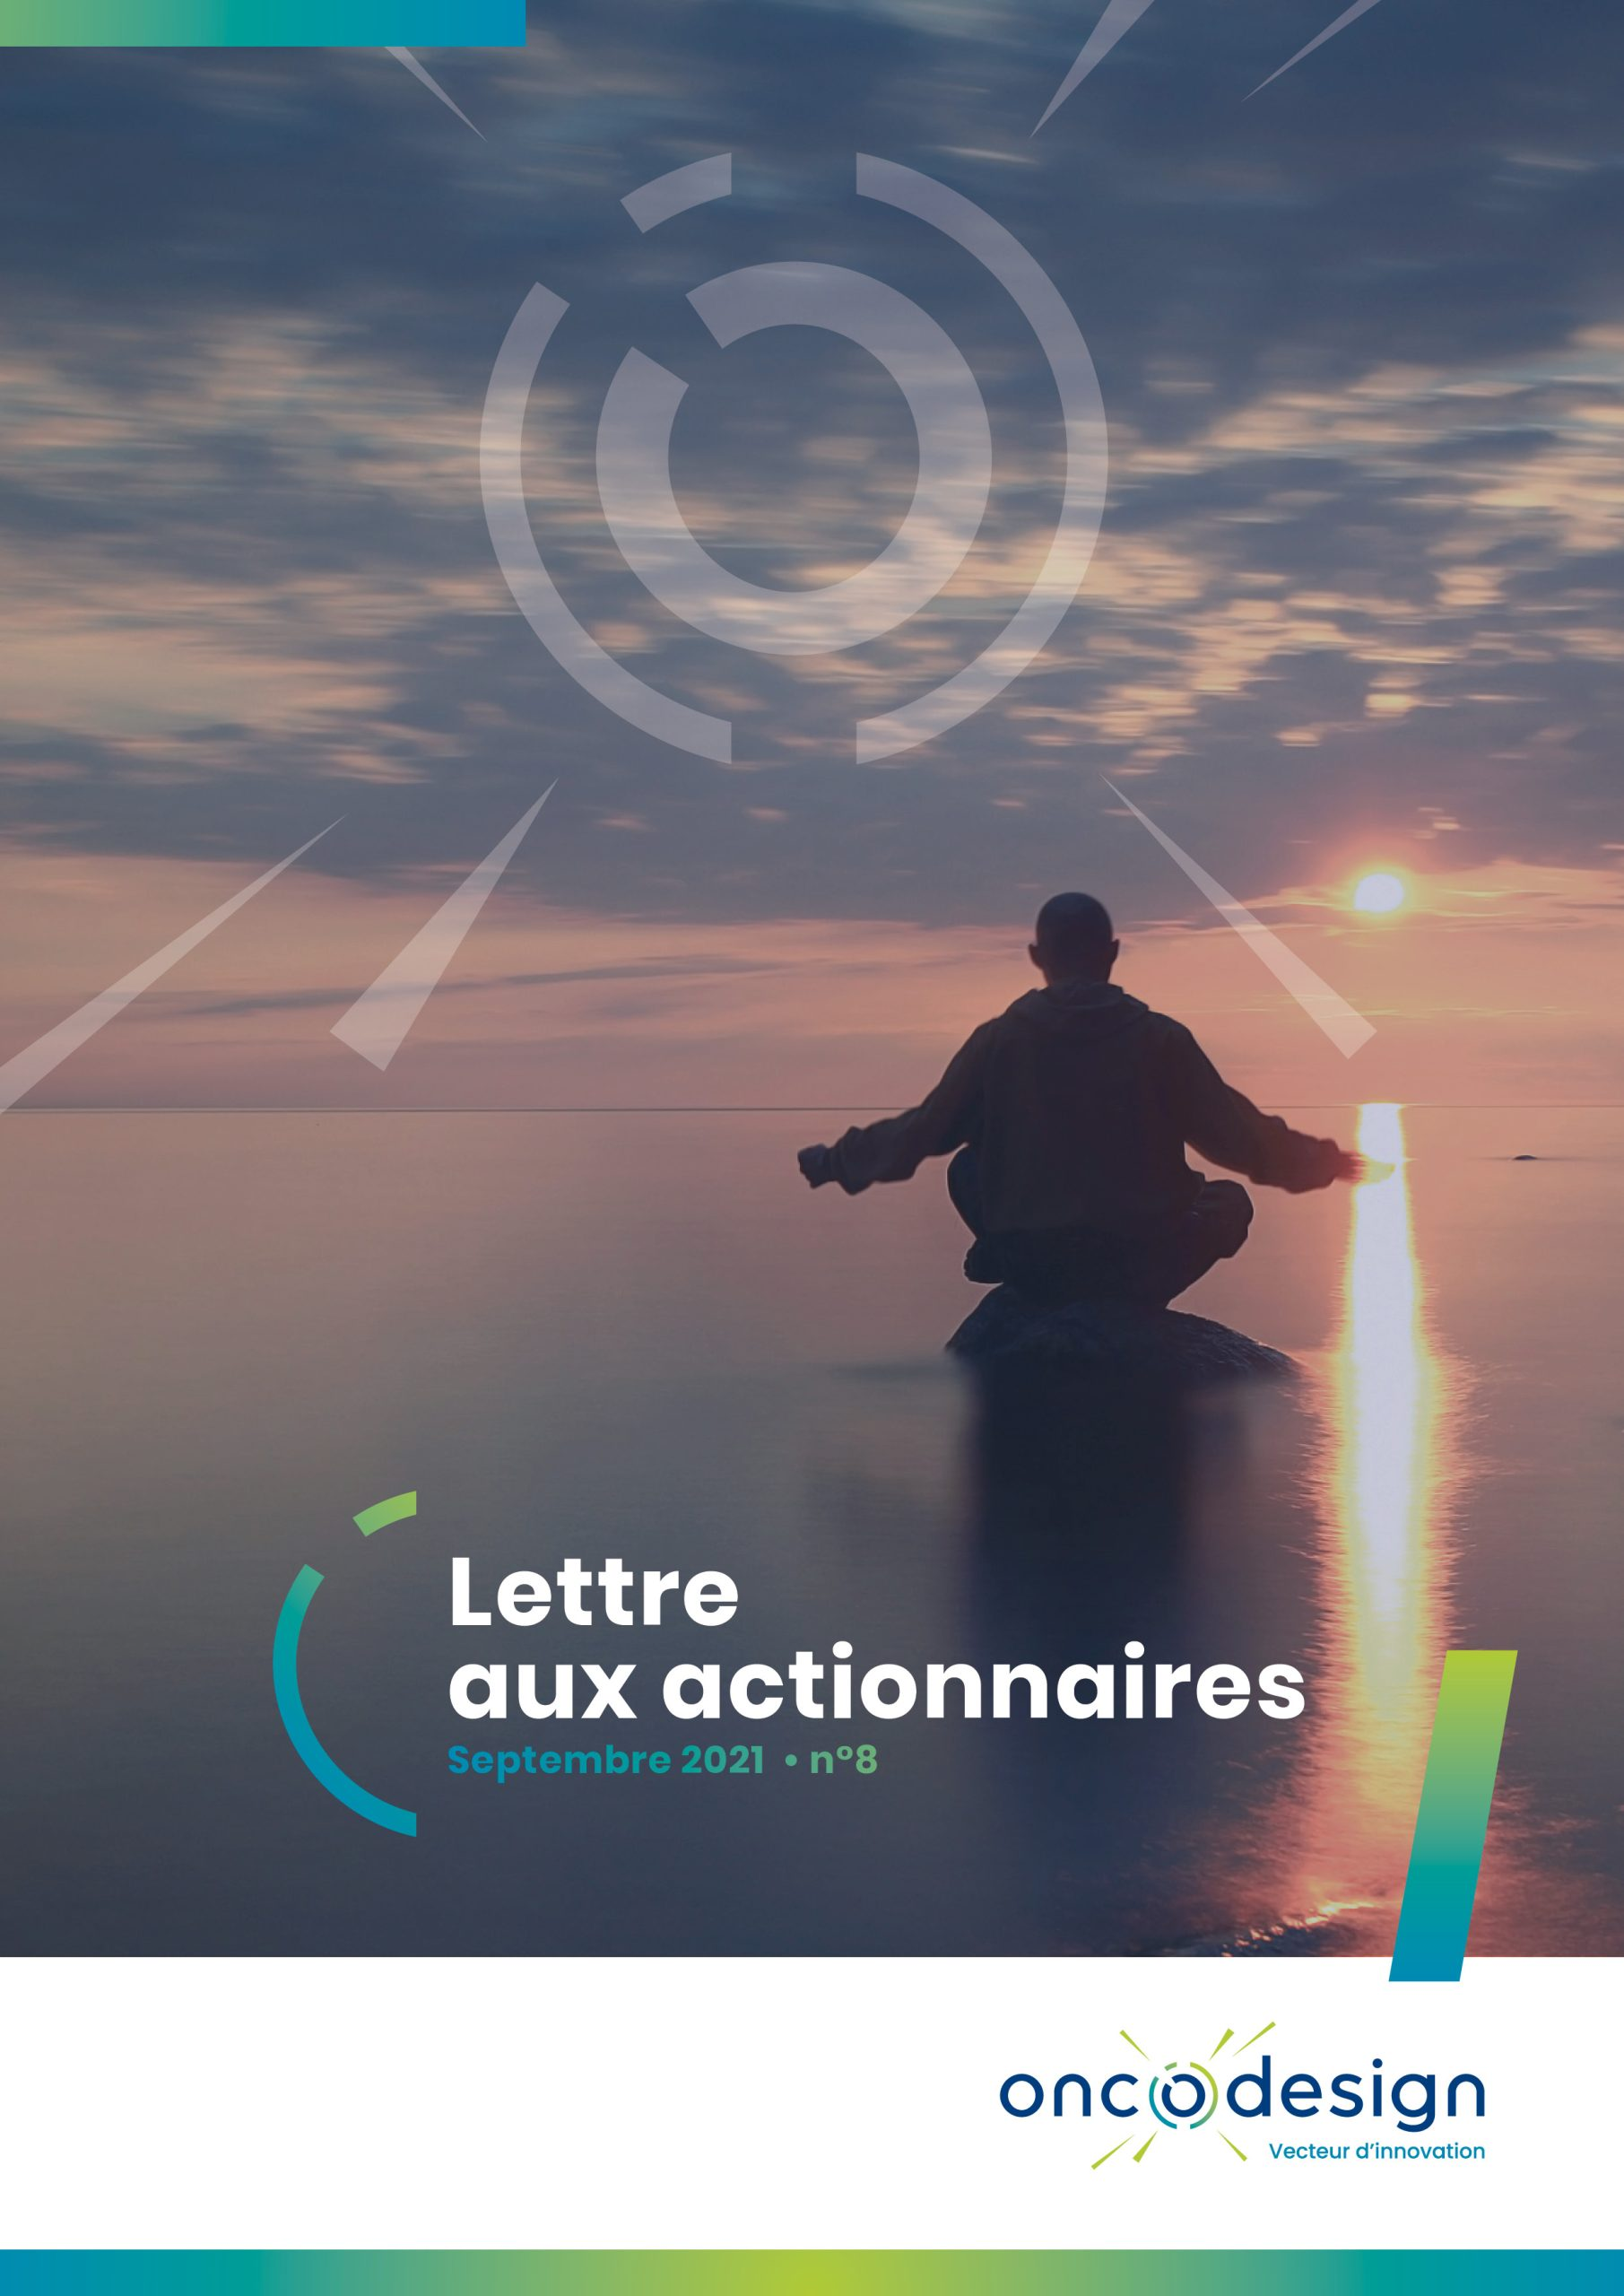 couverture-Lettre-actionnaires-septembre-2021-oncodesign